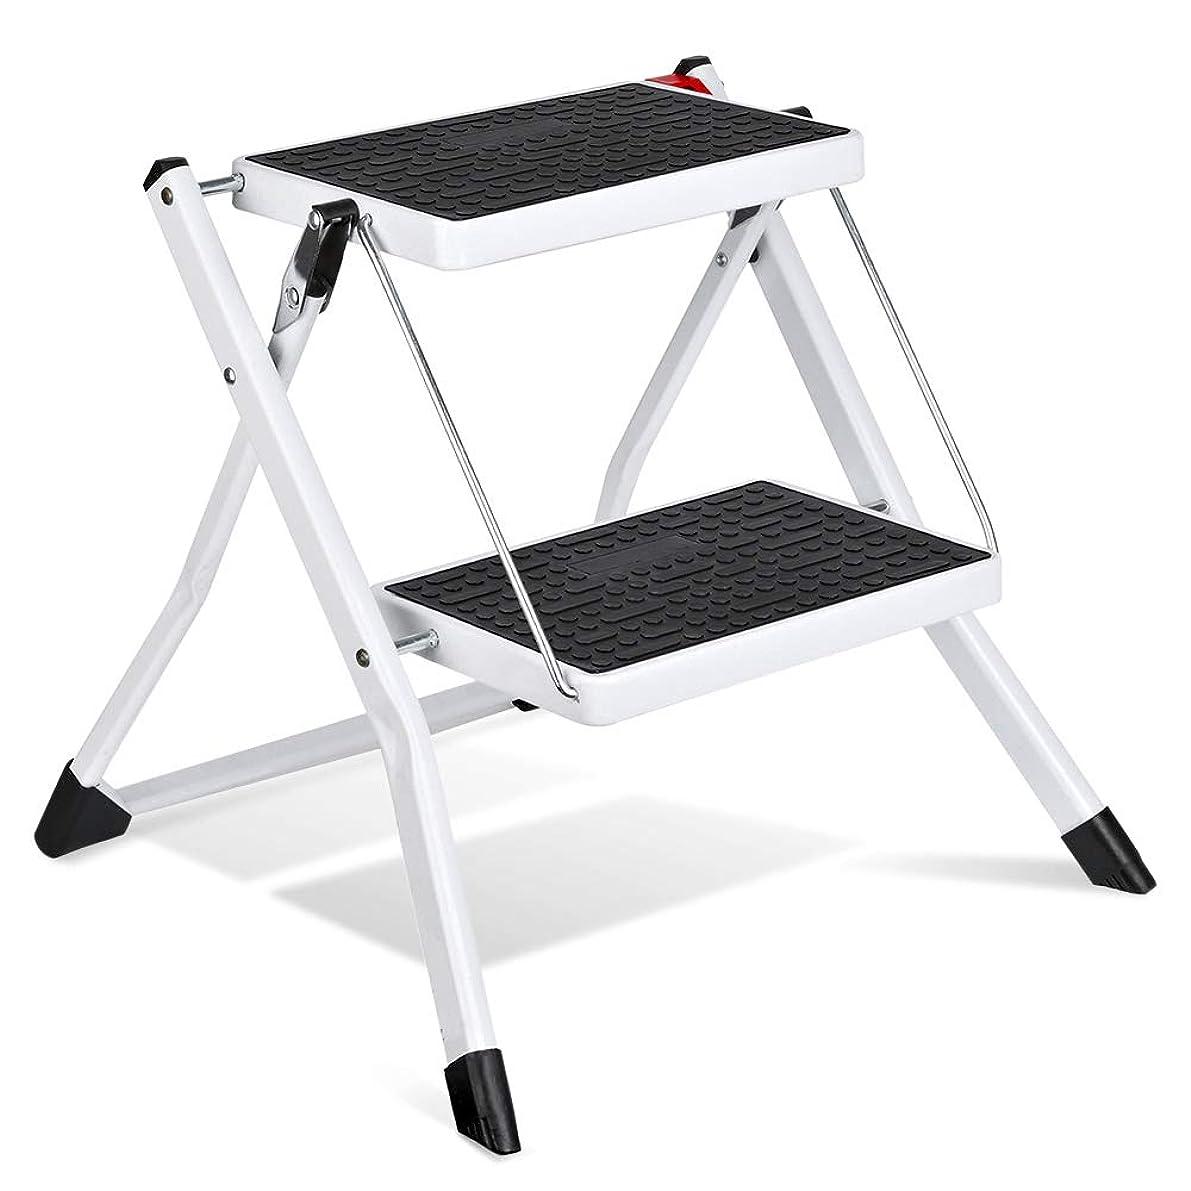 Delxo Step Stool Stepladders Lightweight White Folding Step Ladder with Handgrip Anti-Slip Sturdy and Wide Pedal Steel Ladder Mini-Stool 250lbs 2-Feet (WK2031D)